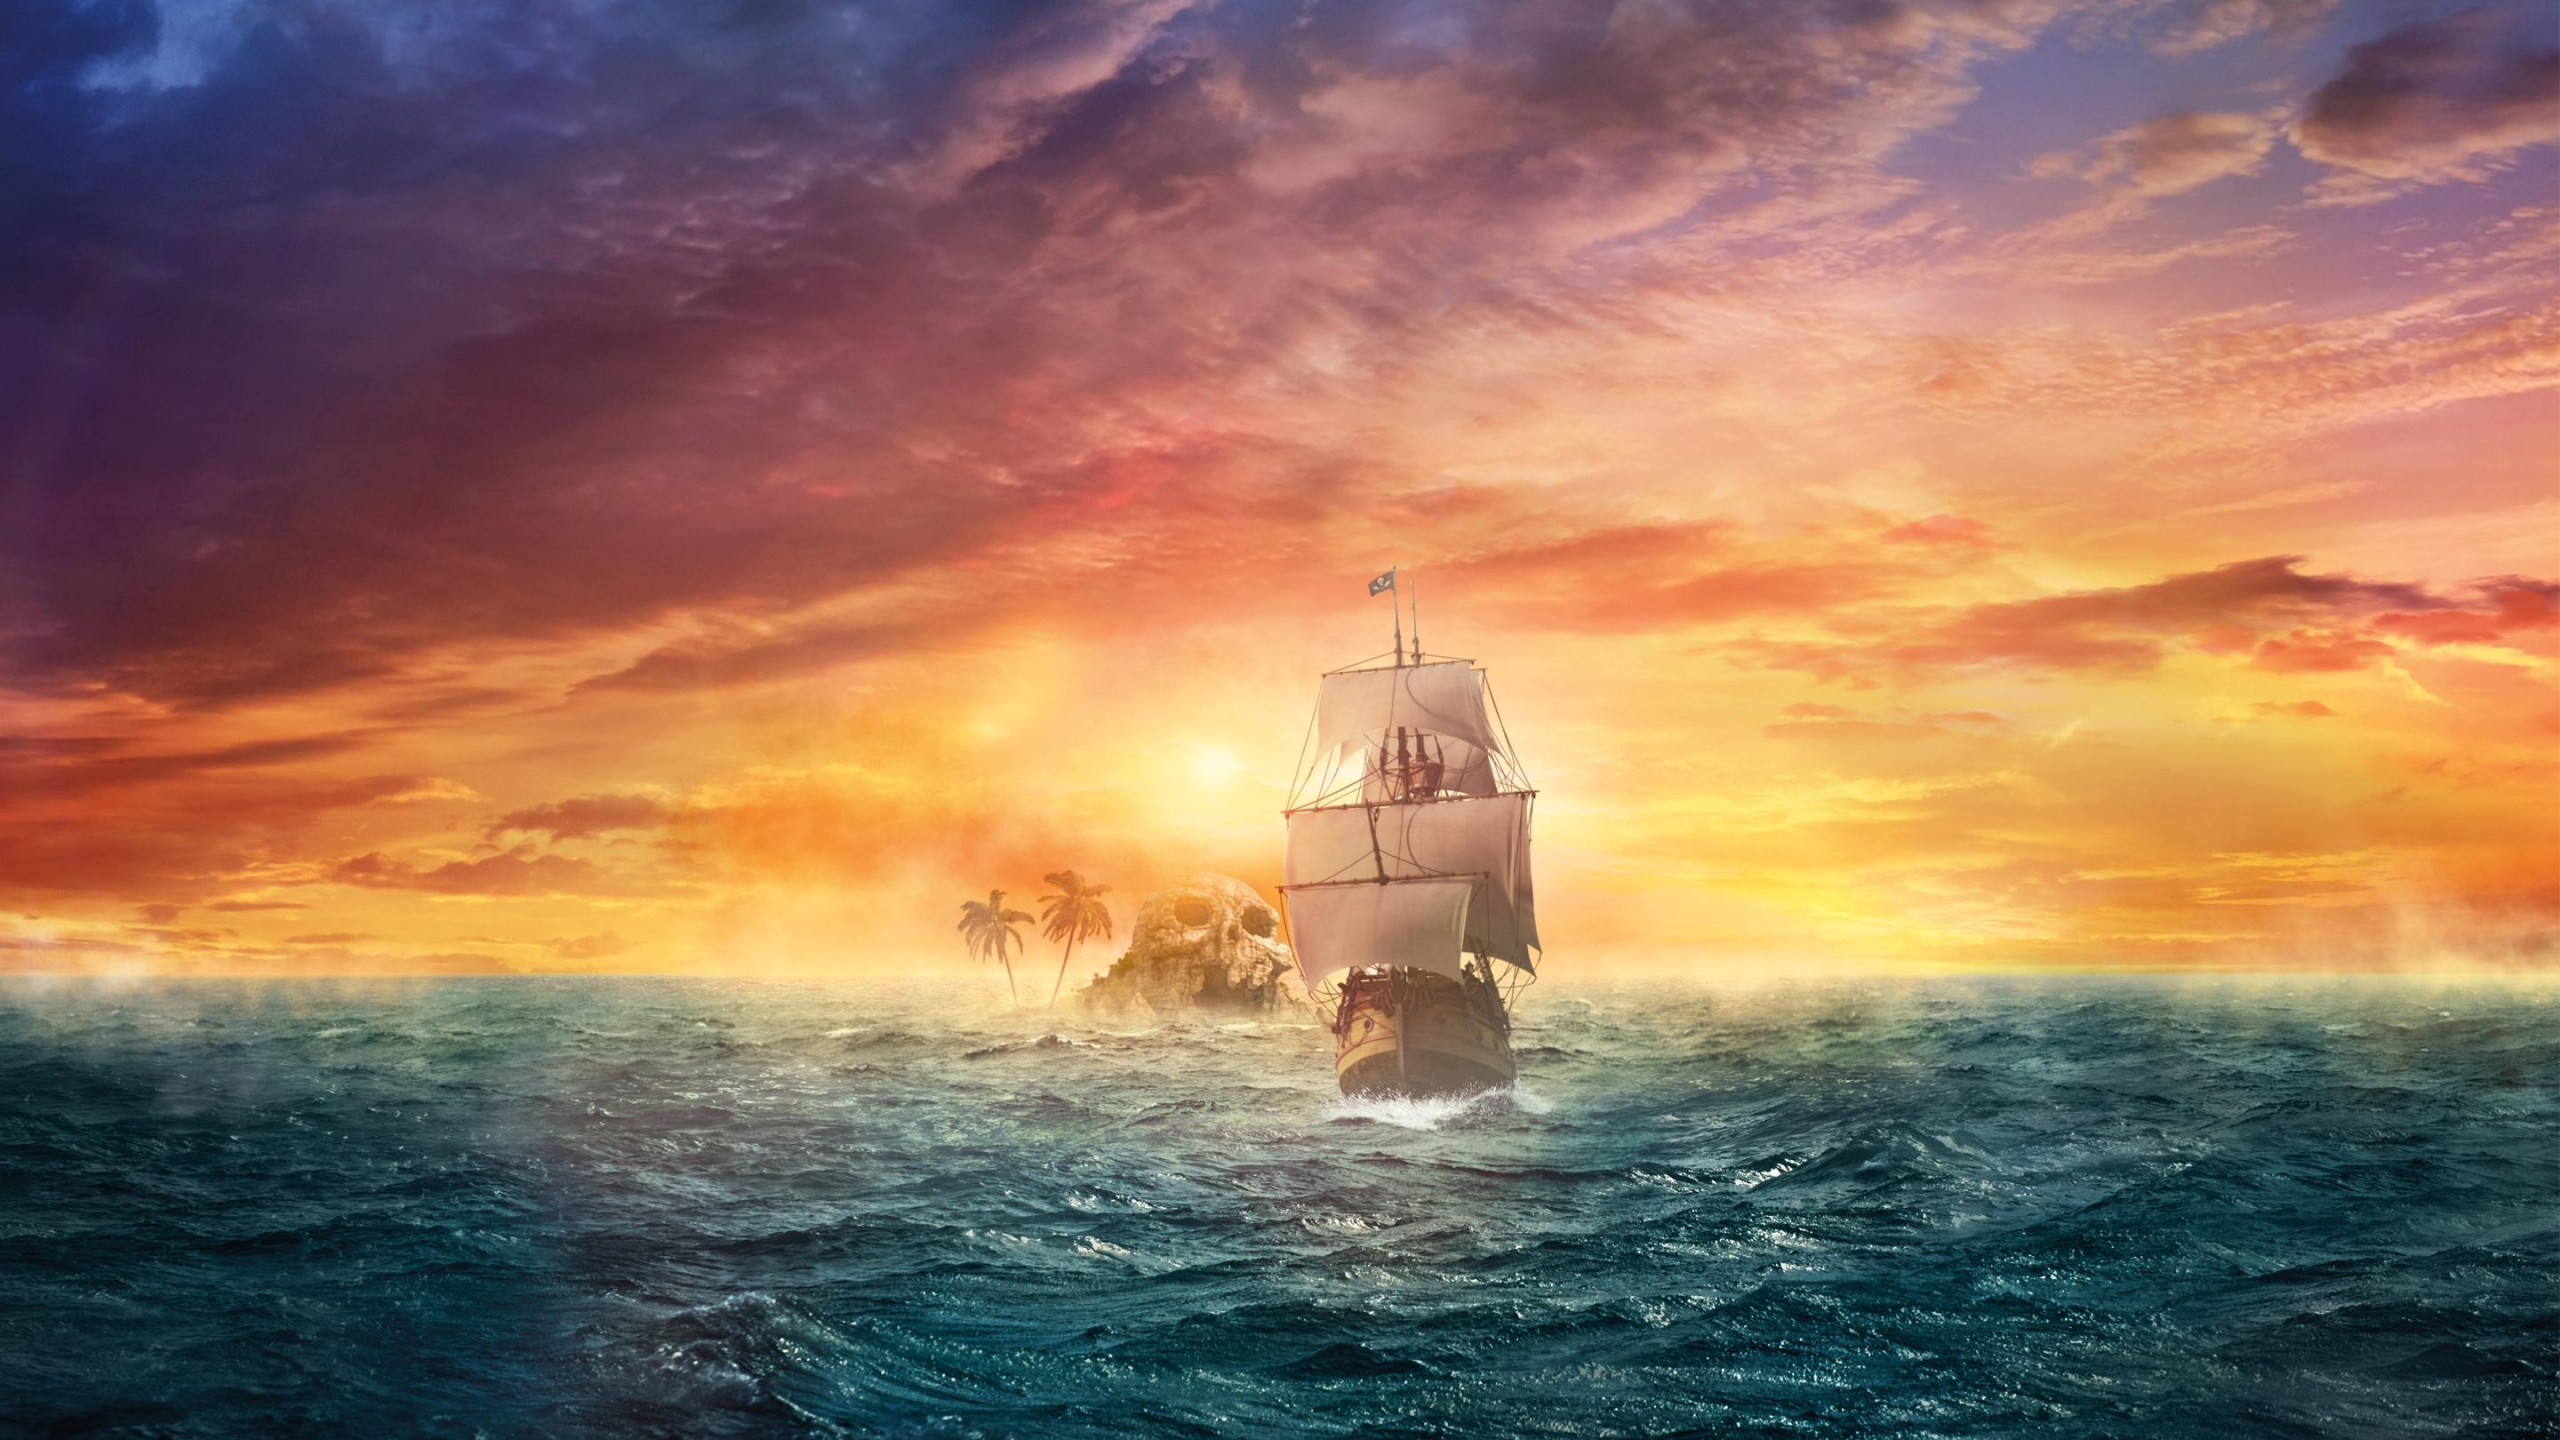 Wallpaper pirate ship sea ocean sunset skull land